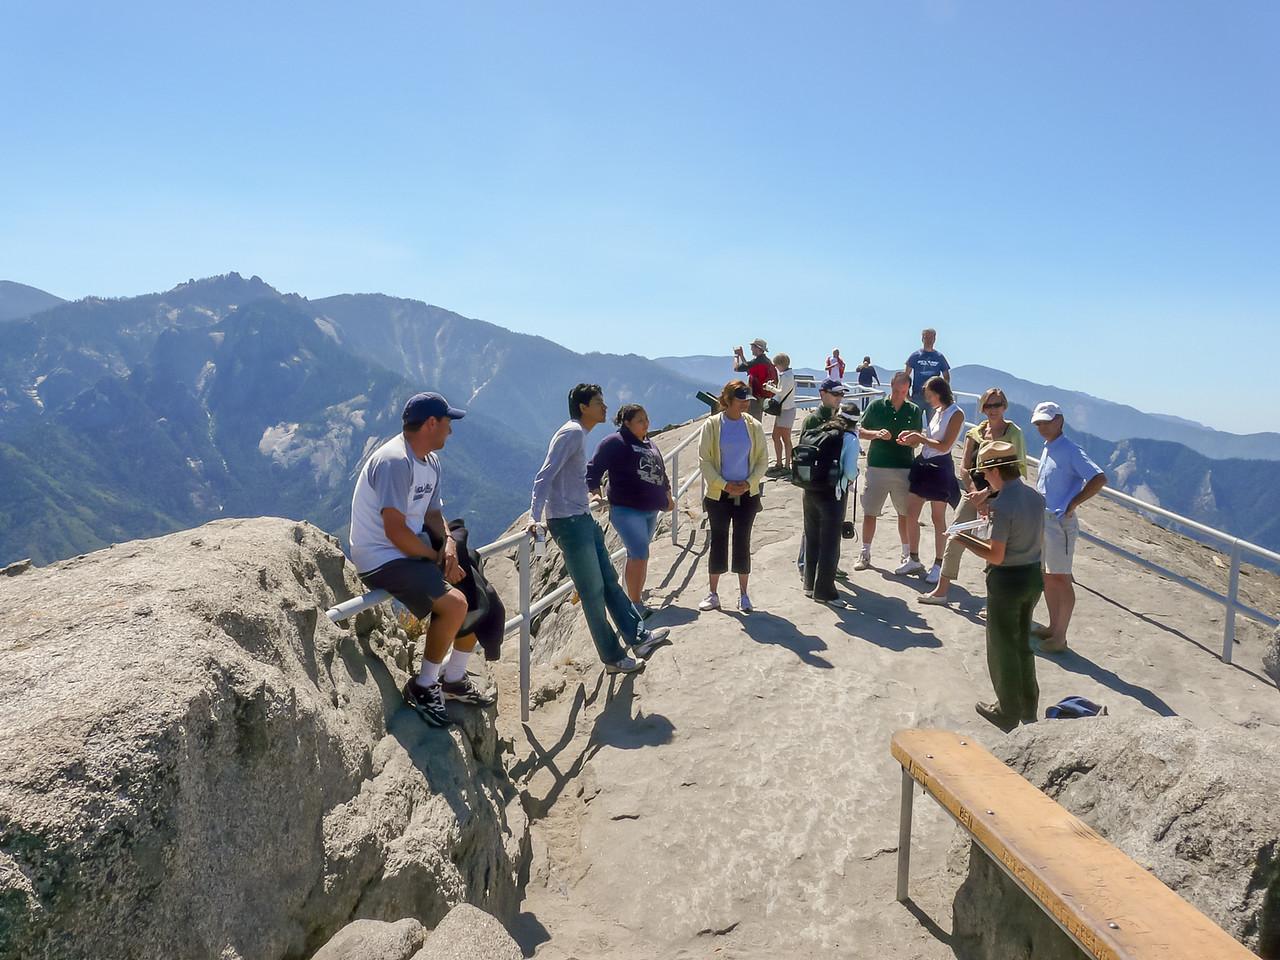 Up top: great views, precipitous drops, and a ranger presentation.